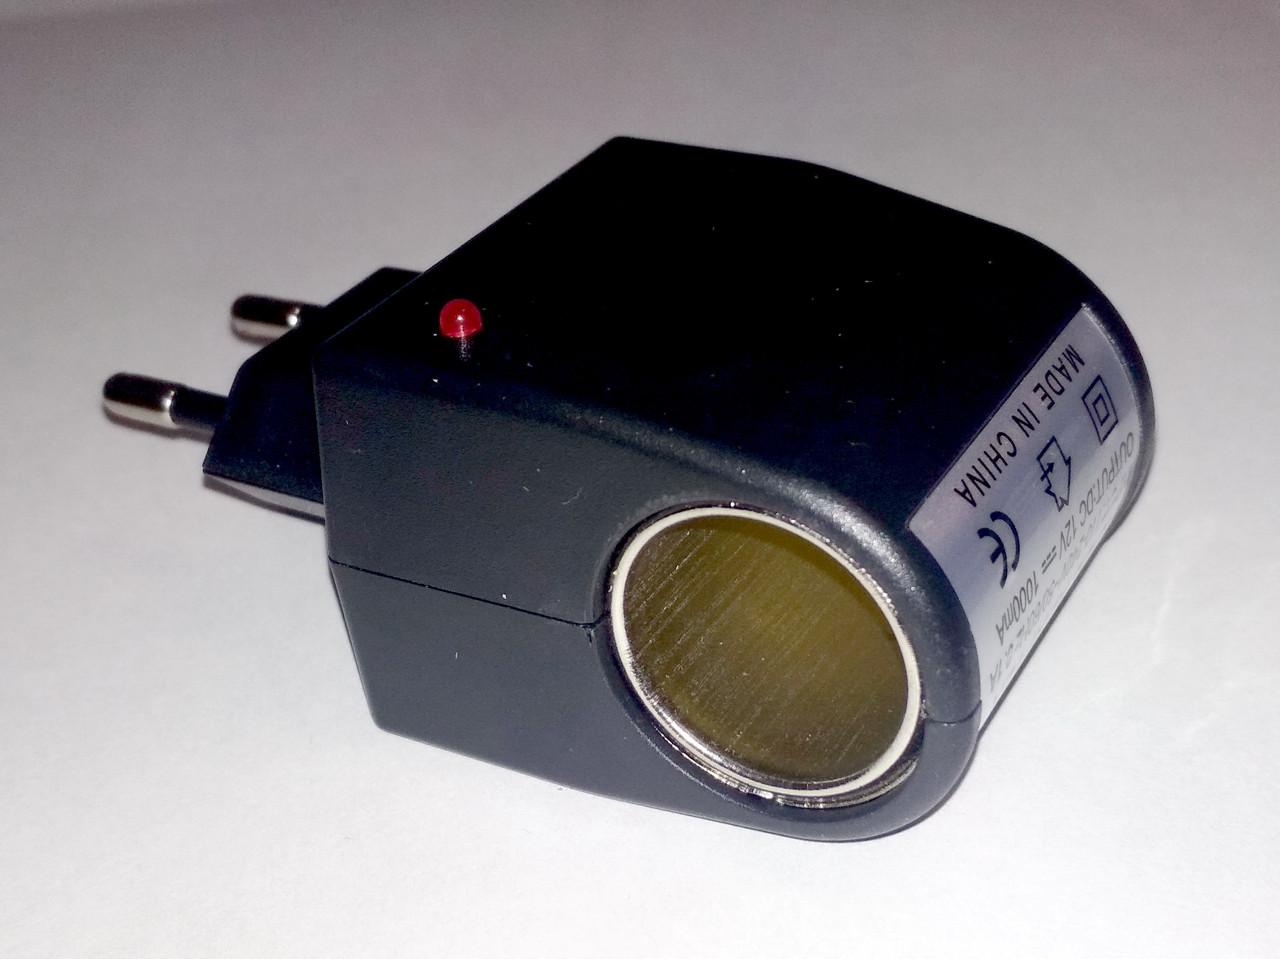 Адаптер сетевой 220V/12V 500mA, под гнездо прикуривателя